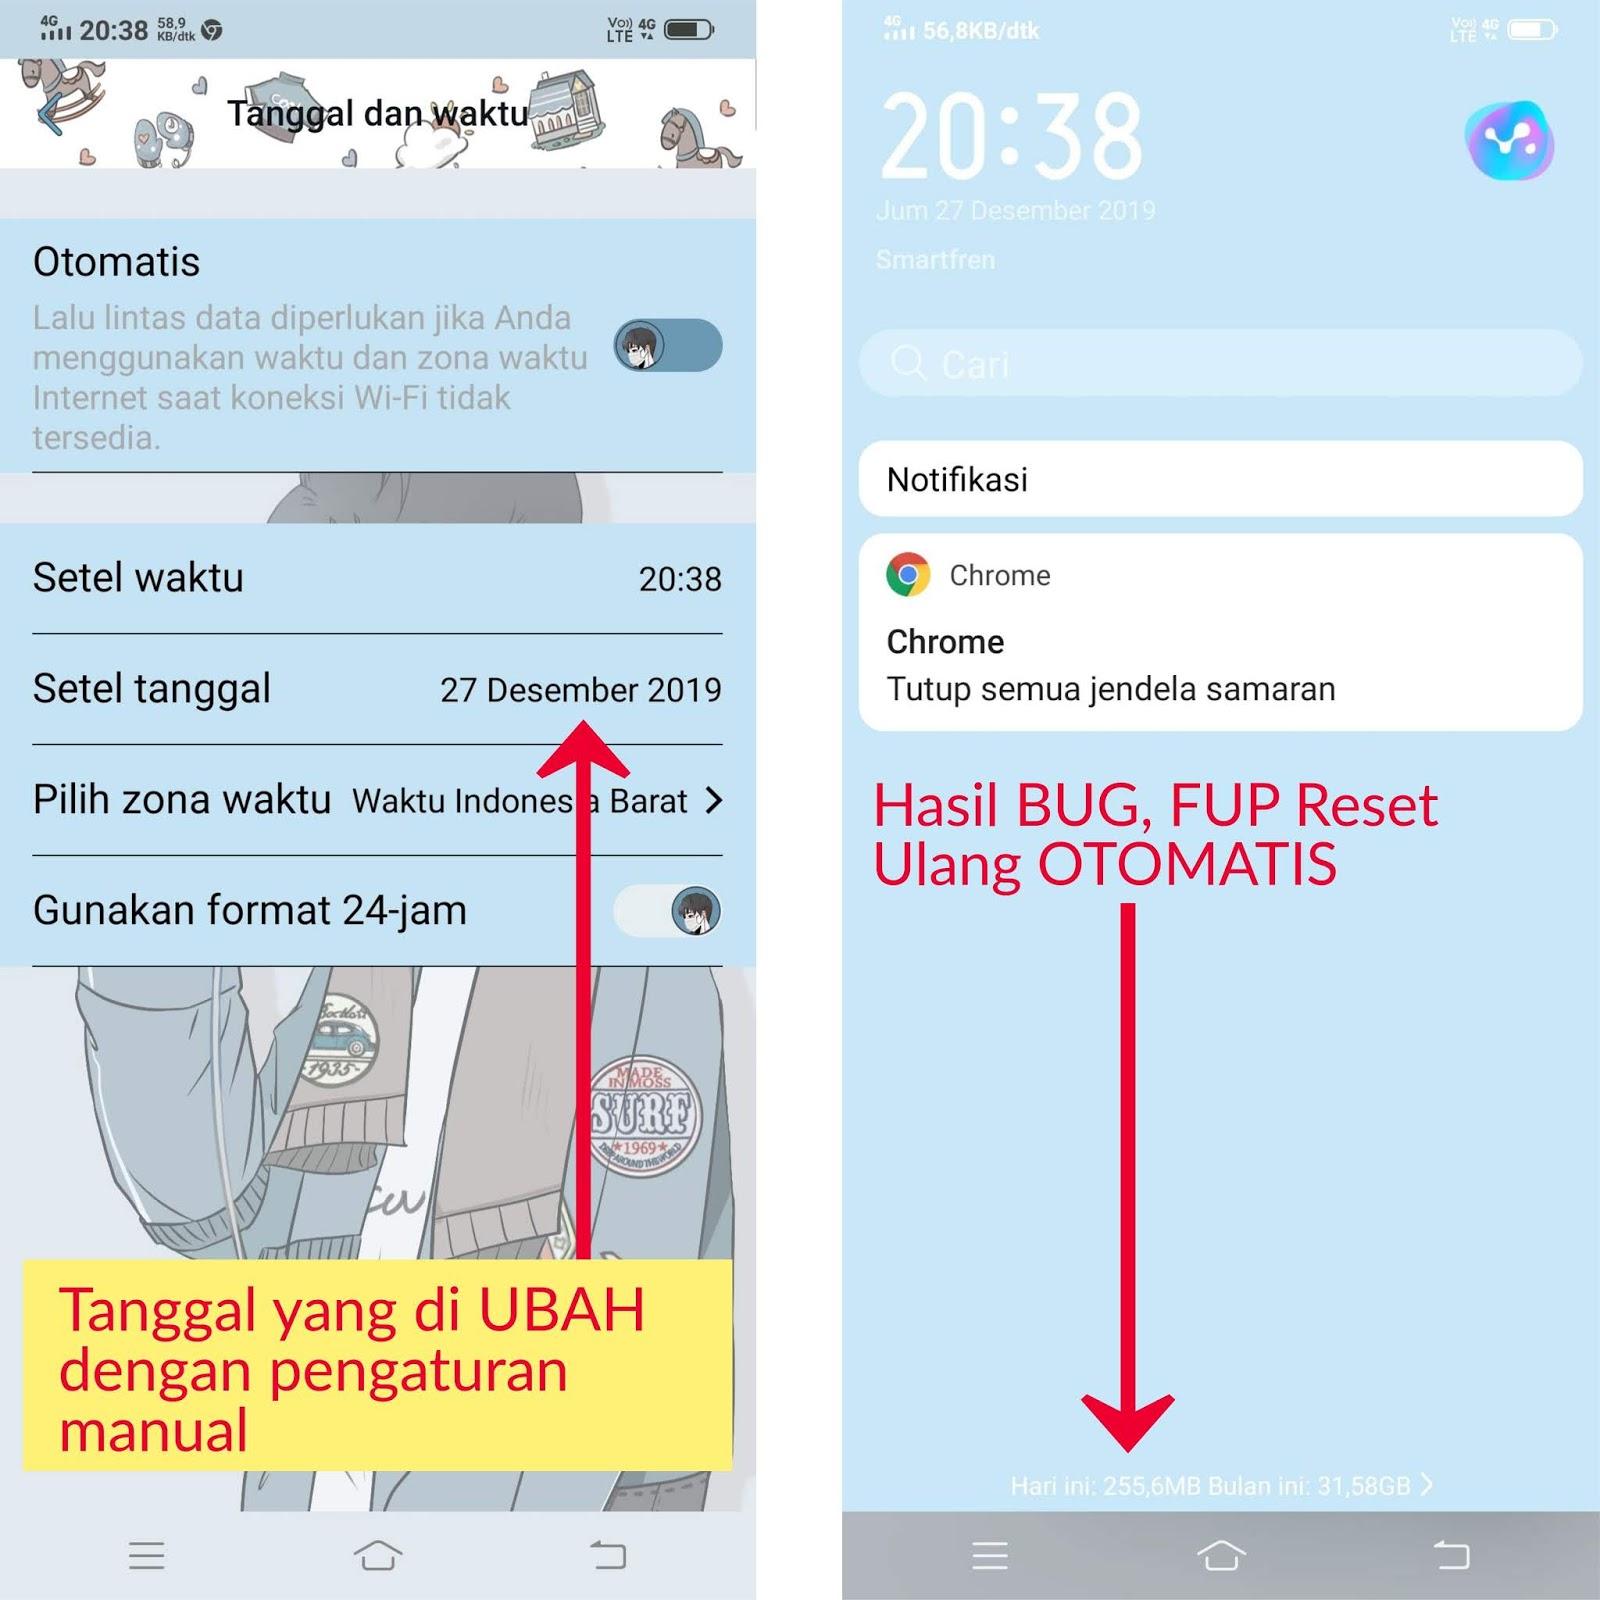 BUG Paket Unlimited SMARTFREN Tanpa FUP